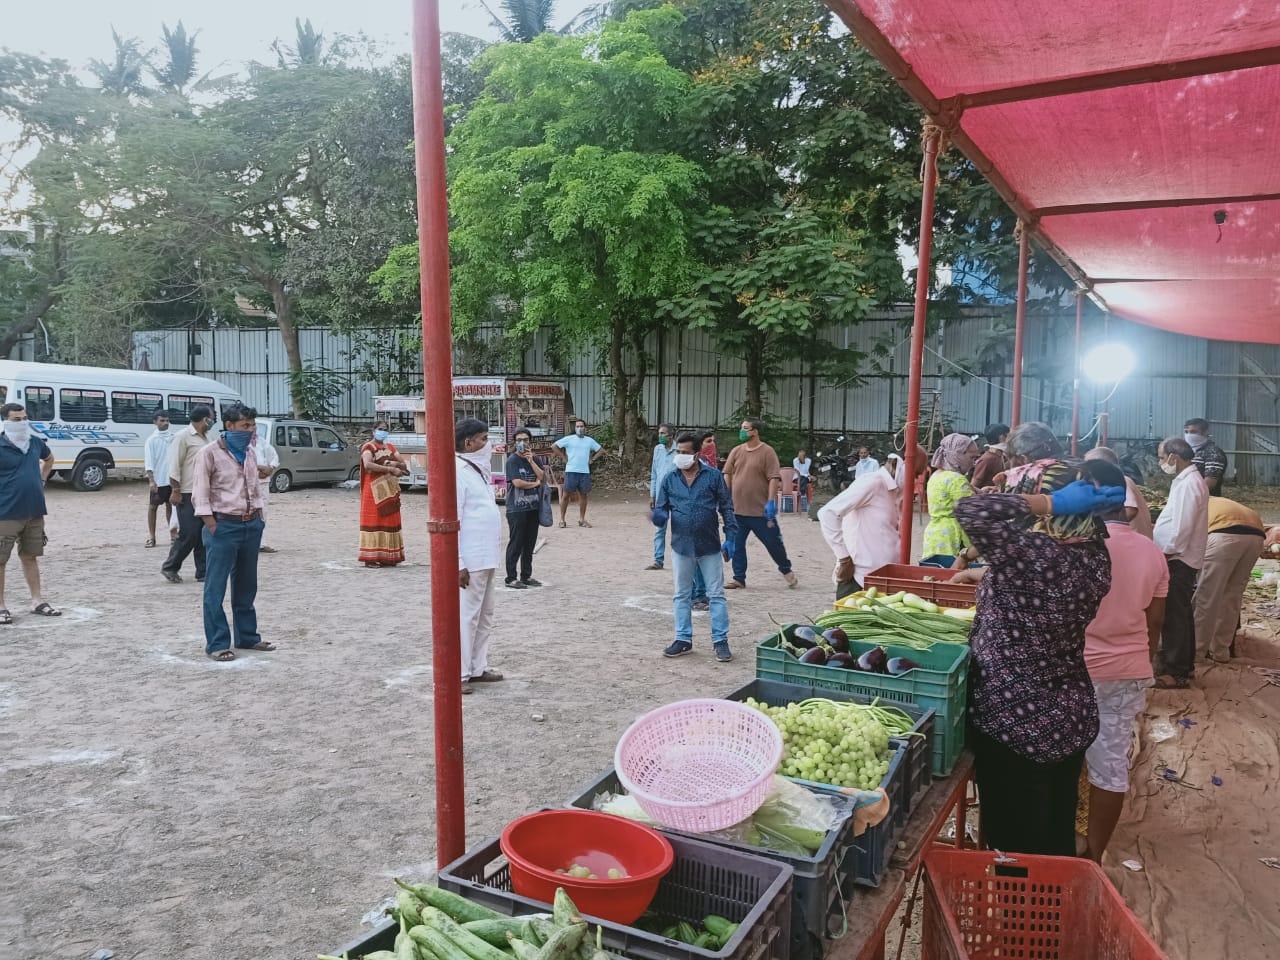 1_FPOs Stall in Navi Mumbai